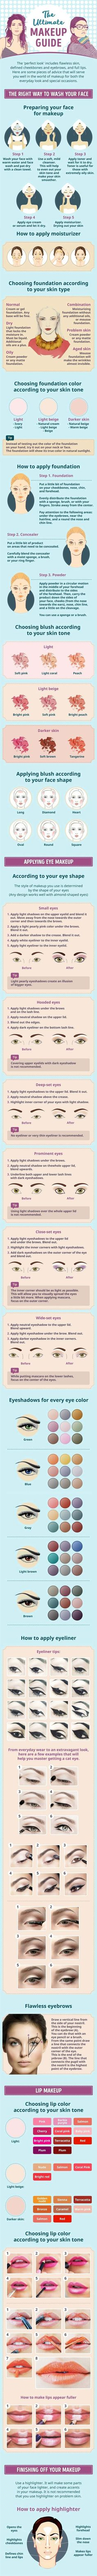 USD5.99 Cosmetics Beauty Makeup Sets Women Fashion Make Up Kits Eyeshadow Lips Eyeliner Makeup Brushes Professional www.aliexpress.com/store/1152210